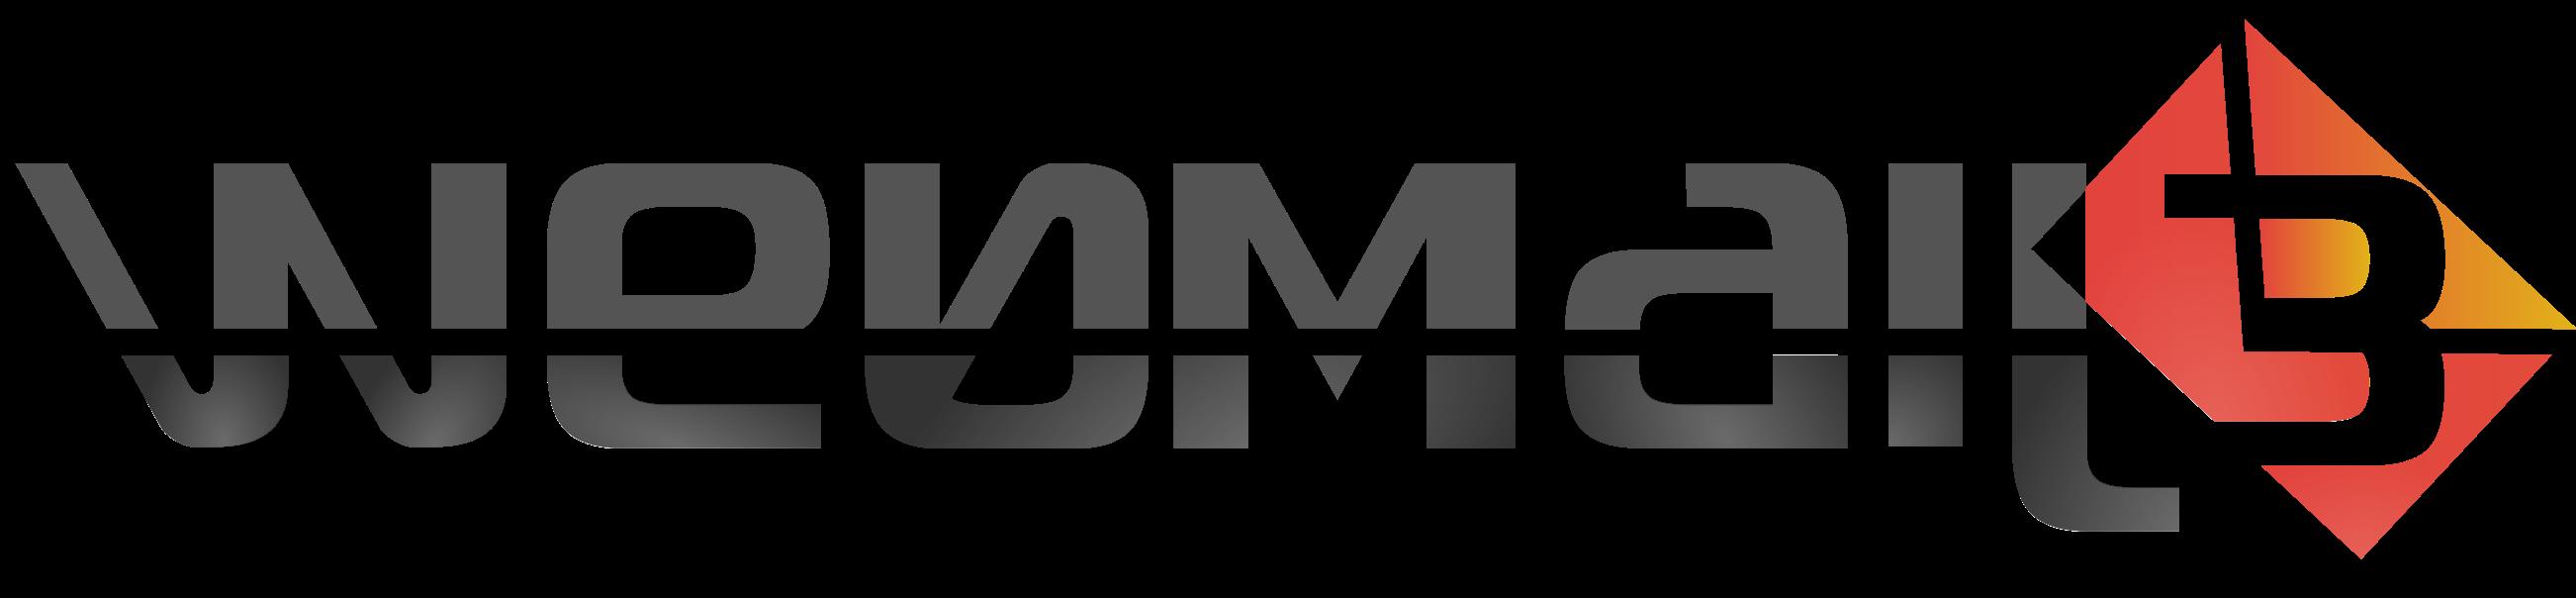 Webmail3 logo